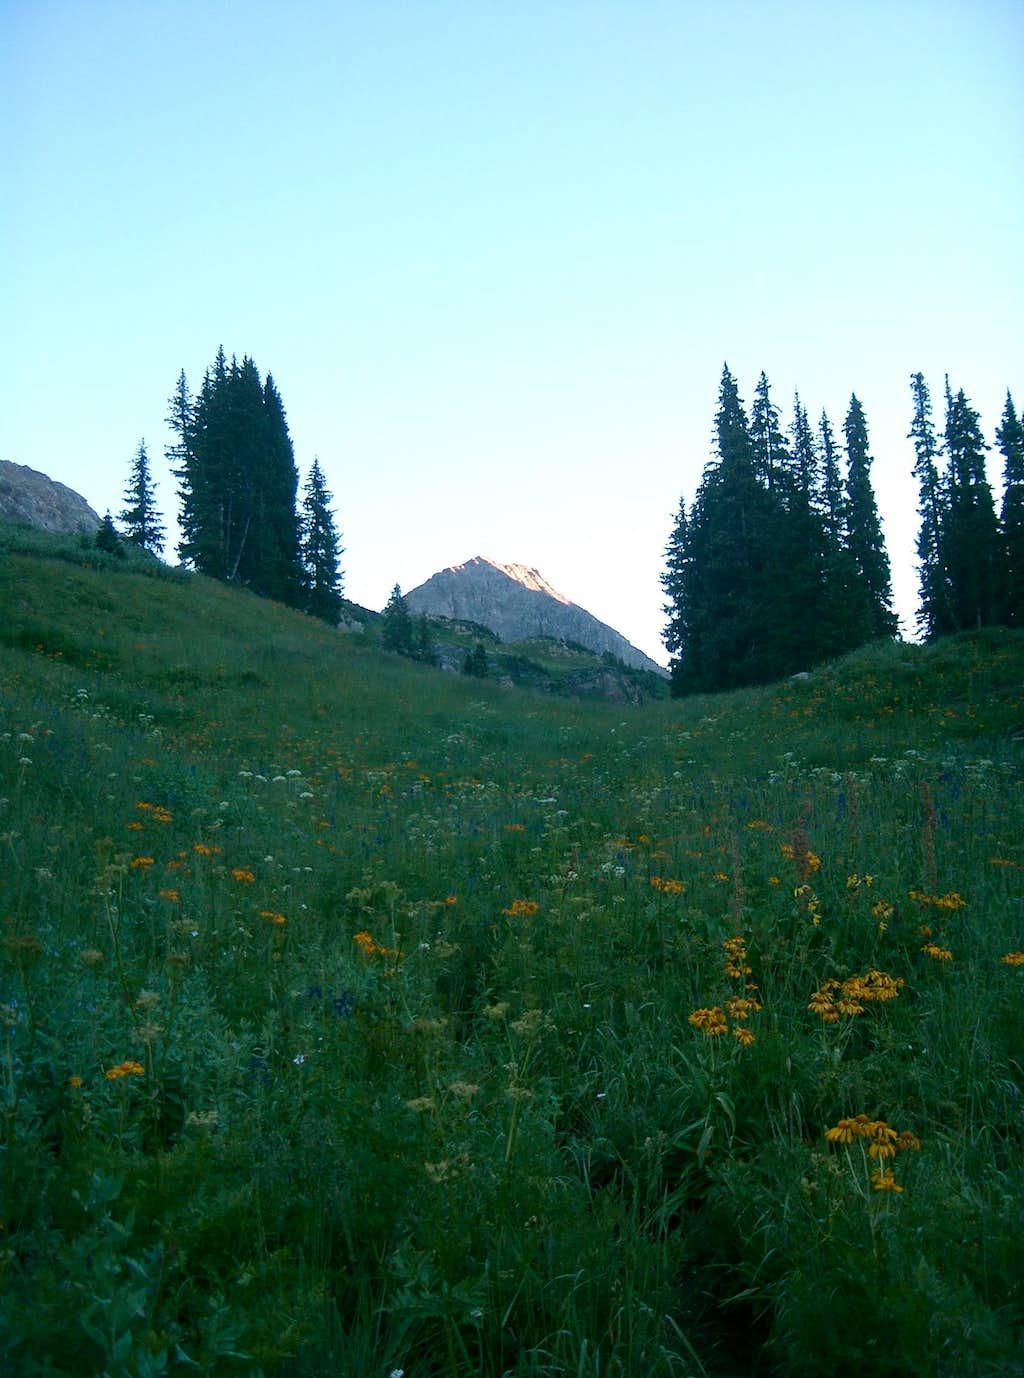 Siberia Peak from Little Gem Lake Trail